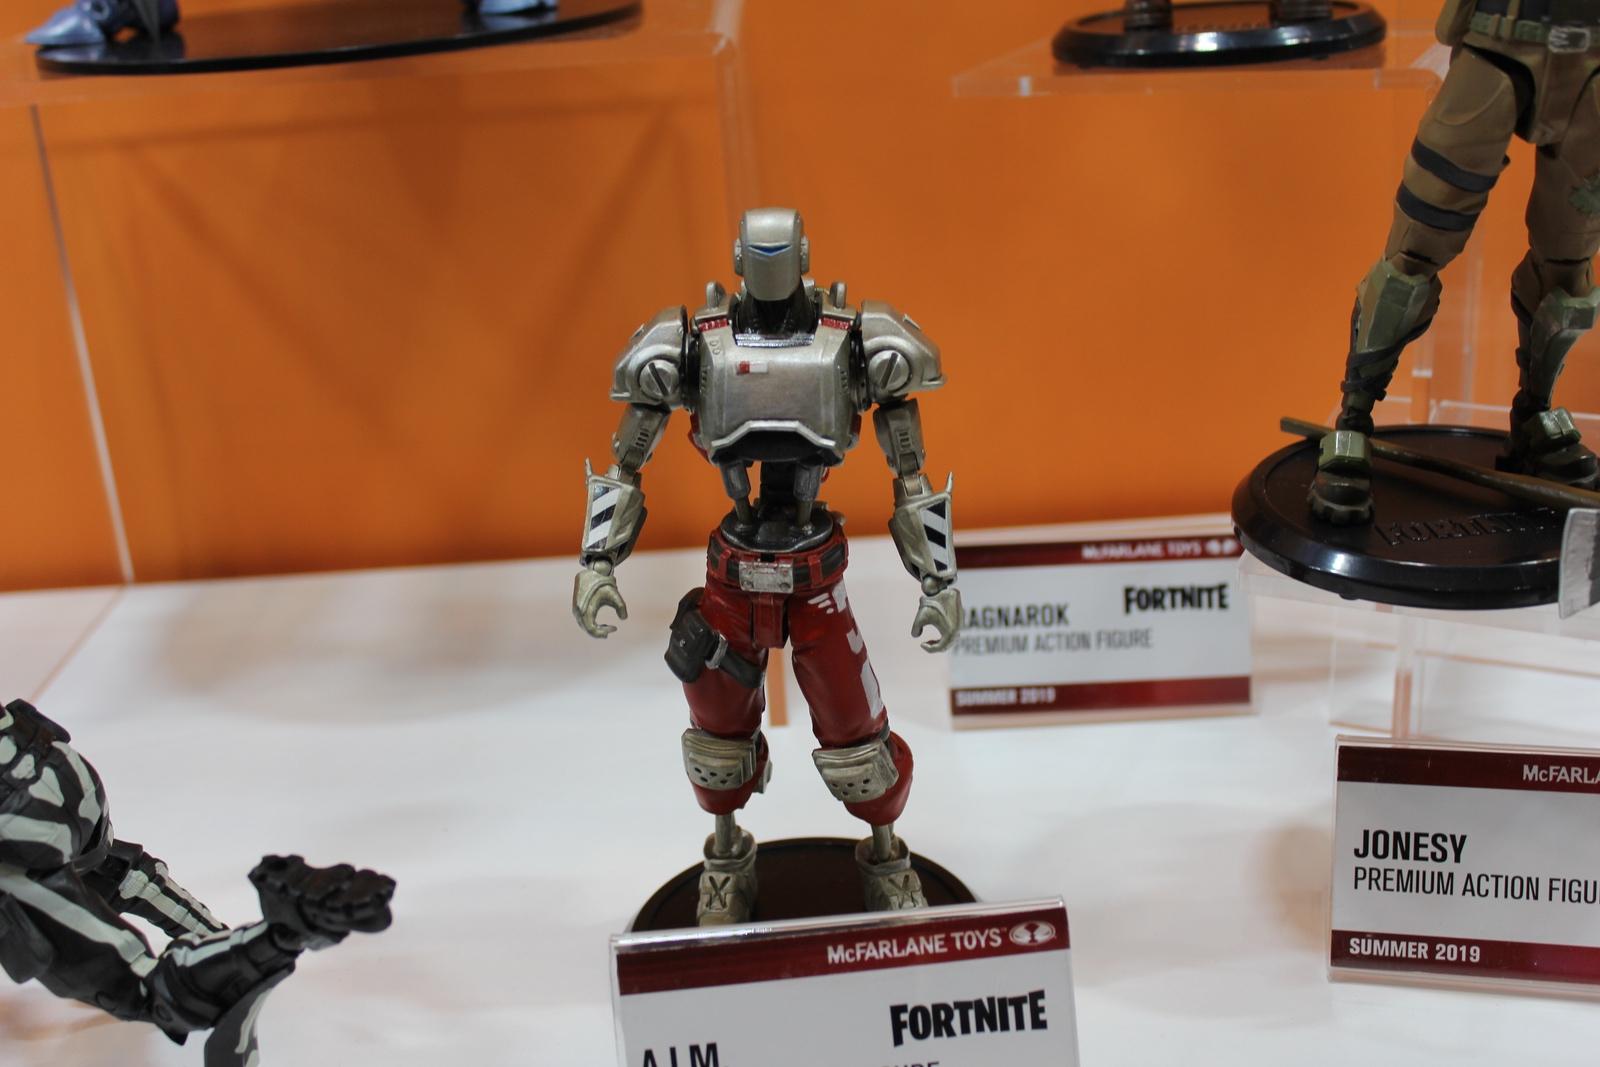 McFarlane Toys at Toy Fair: Fortnite as far as the eye can